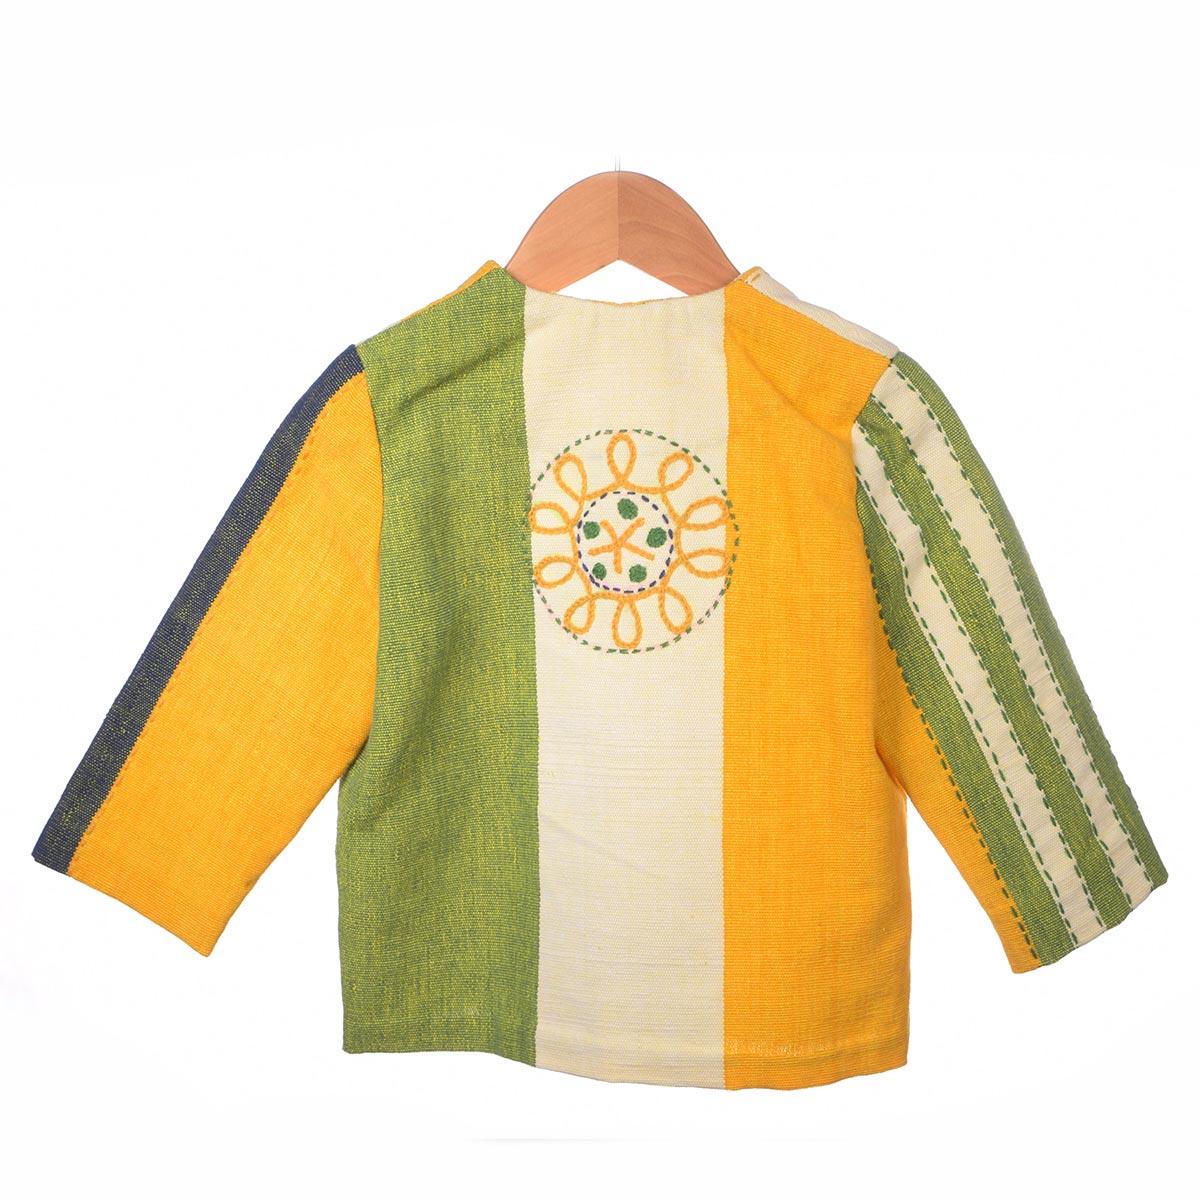 Geel/groen gestreept jasje, cirkels, achterzijde